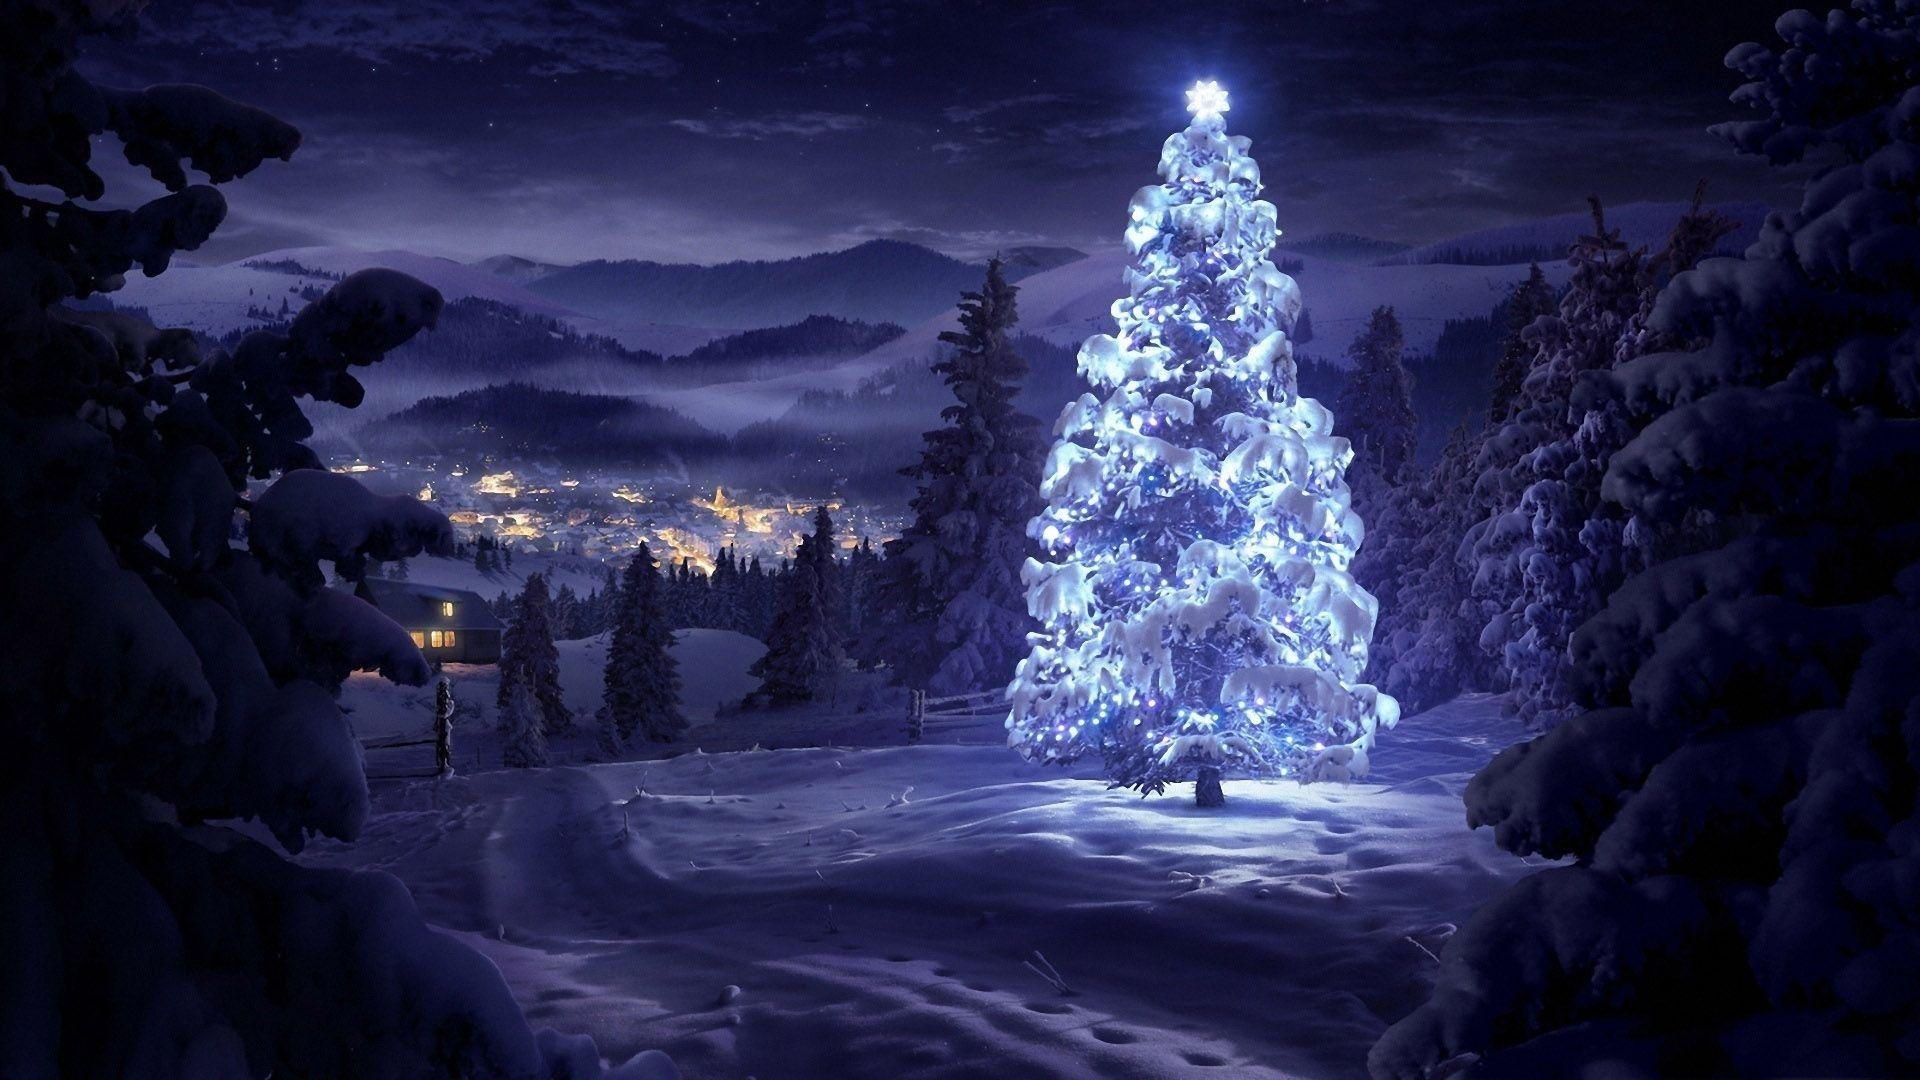 Unique Animated Christmas Desktop Screensavers